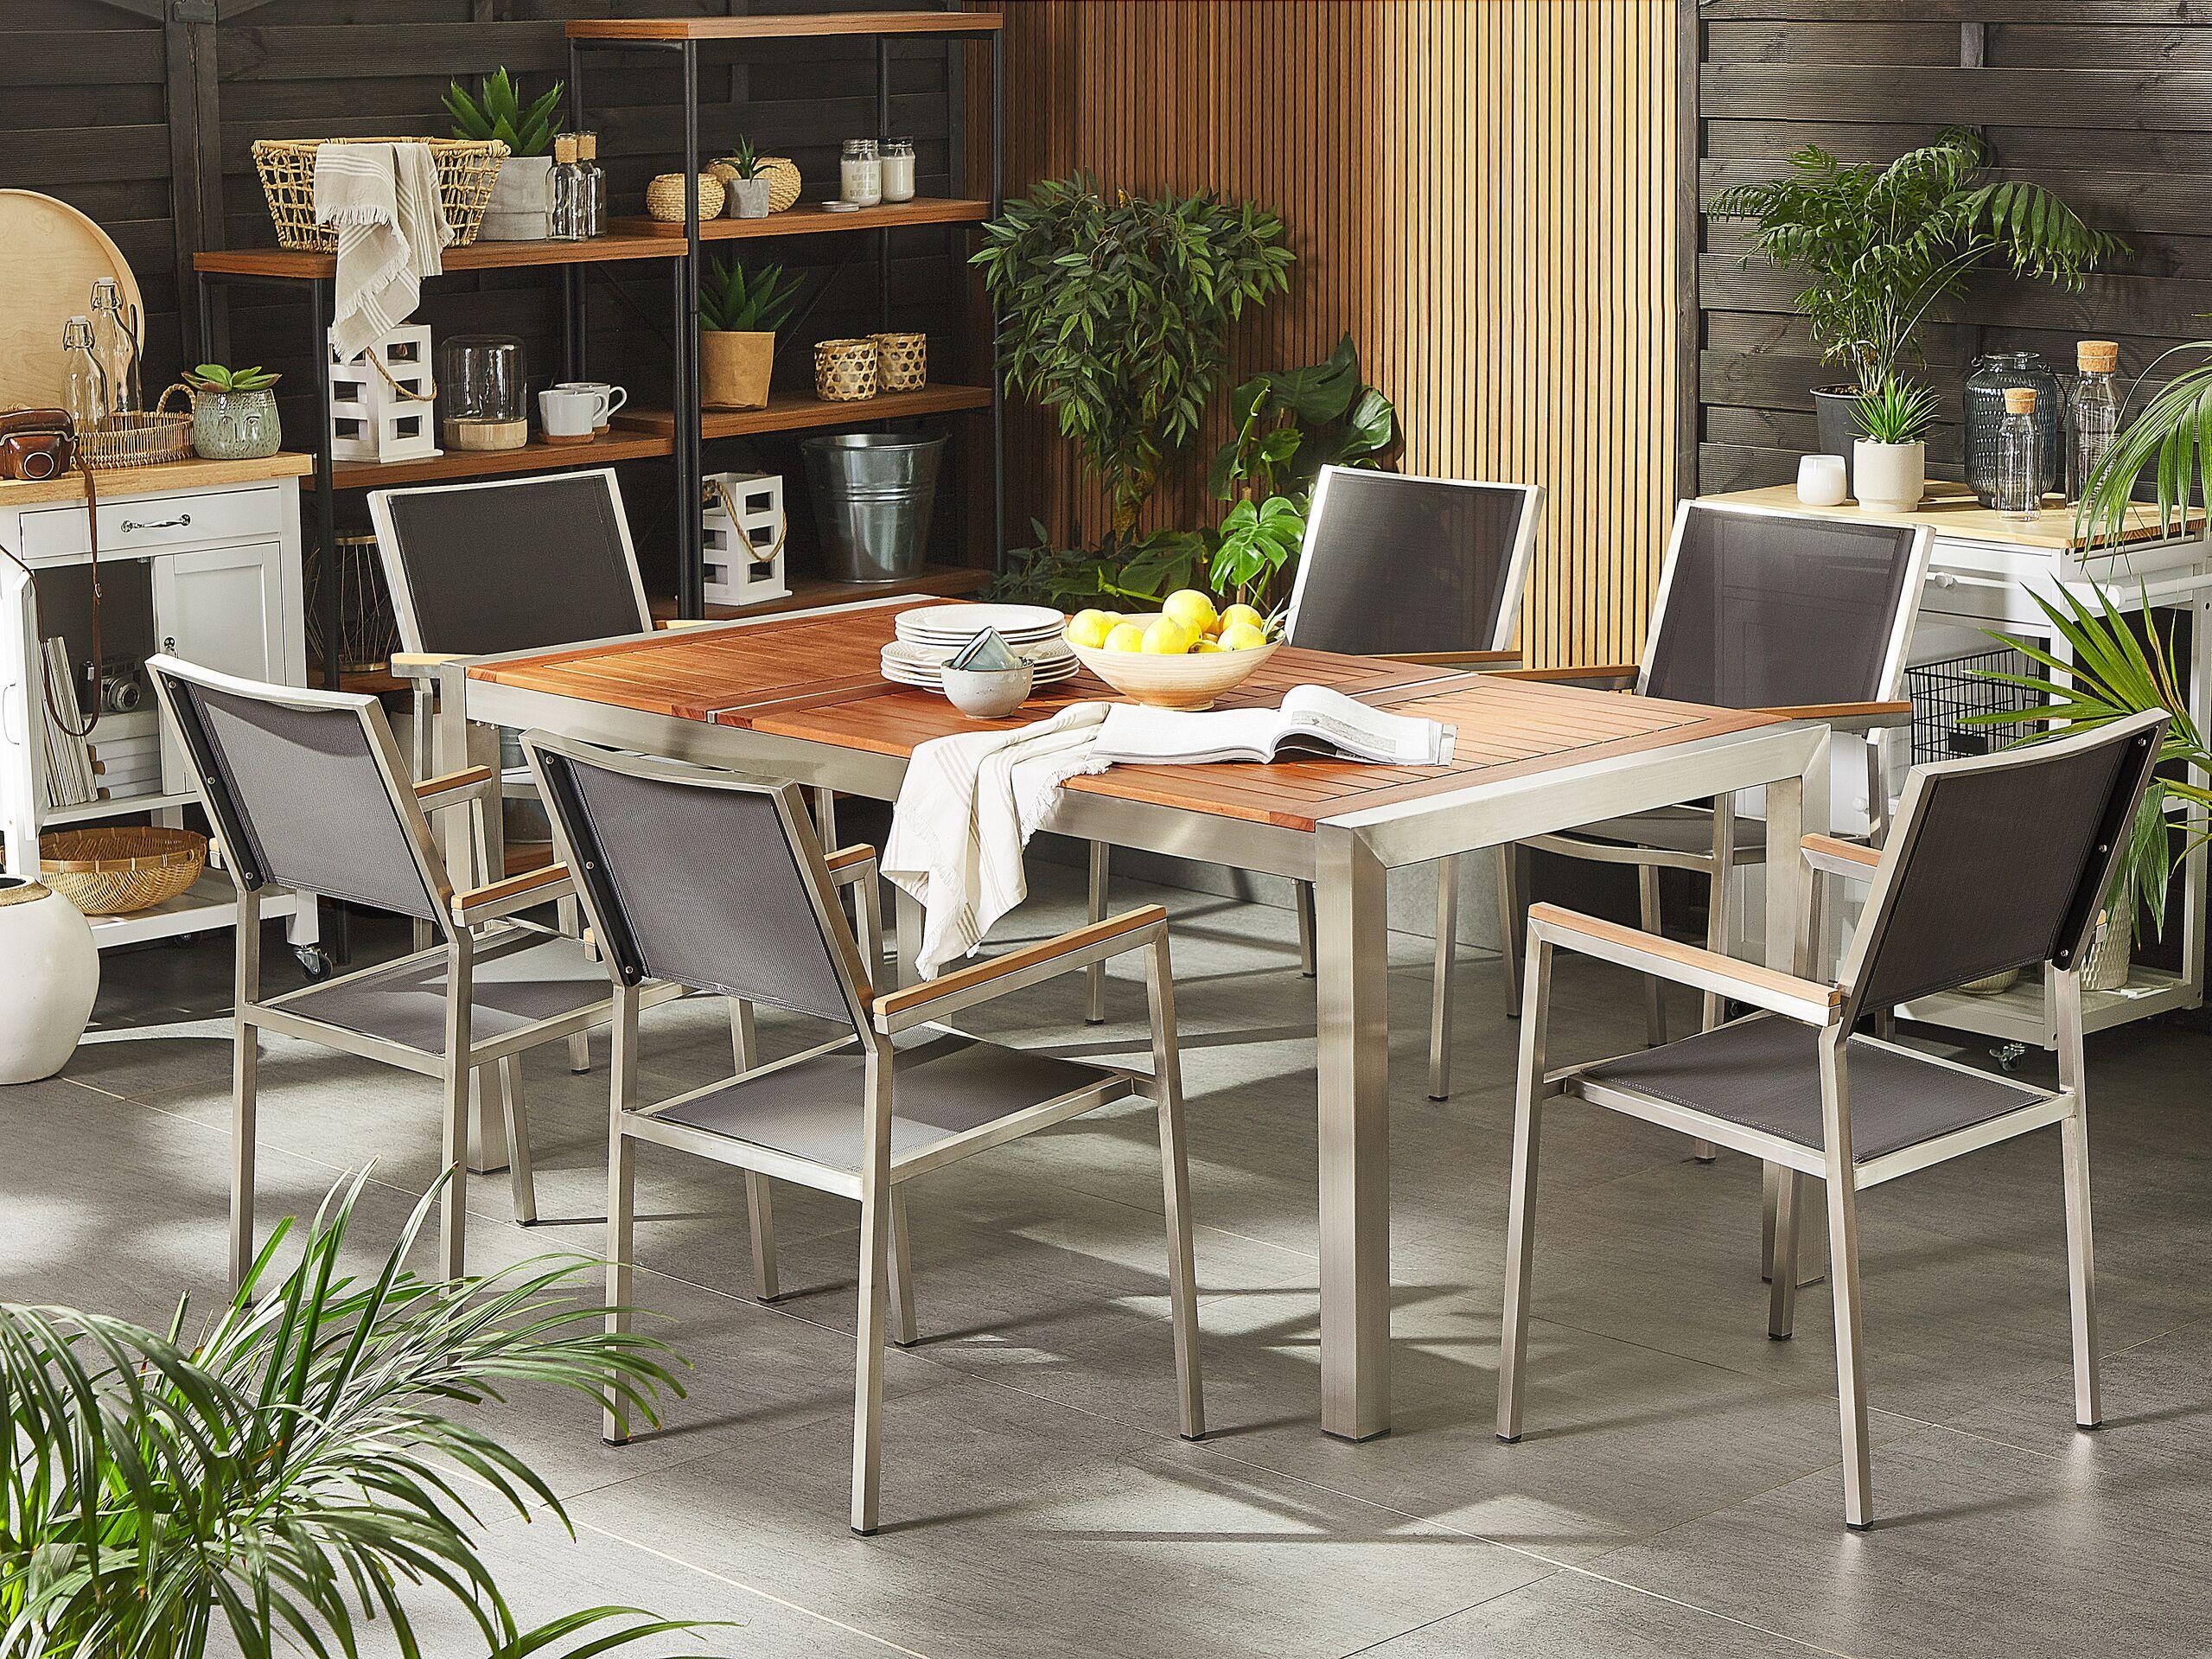 beliani tavolo da giardino legno di eucalipto chiaro gambe acciaio 180 x 90 cm